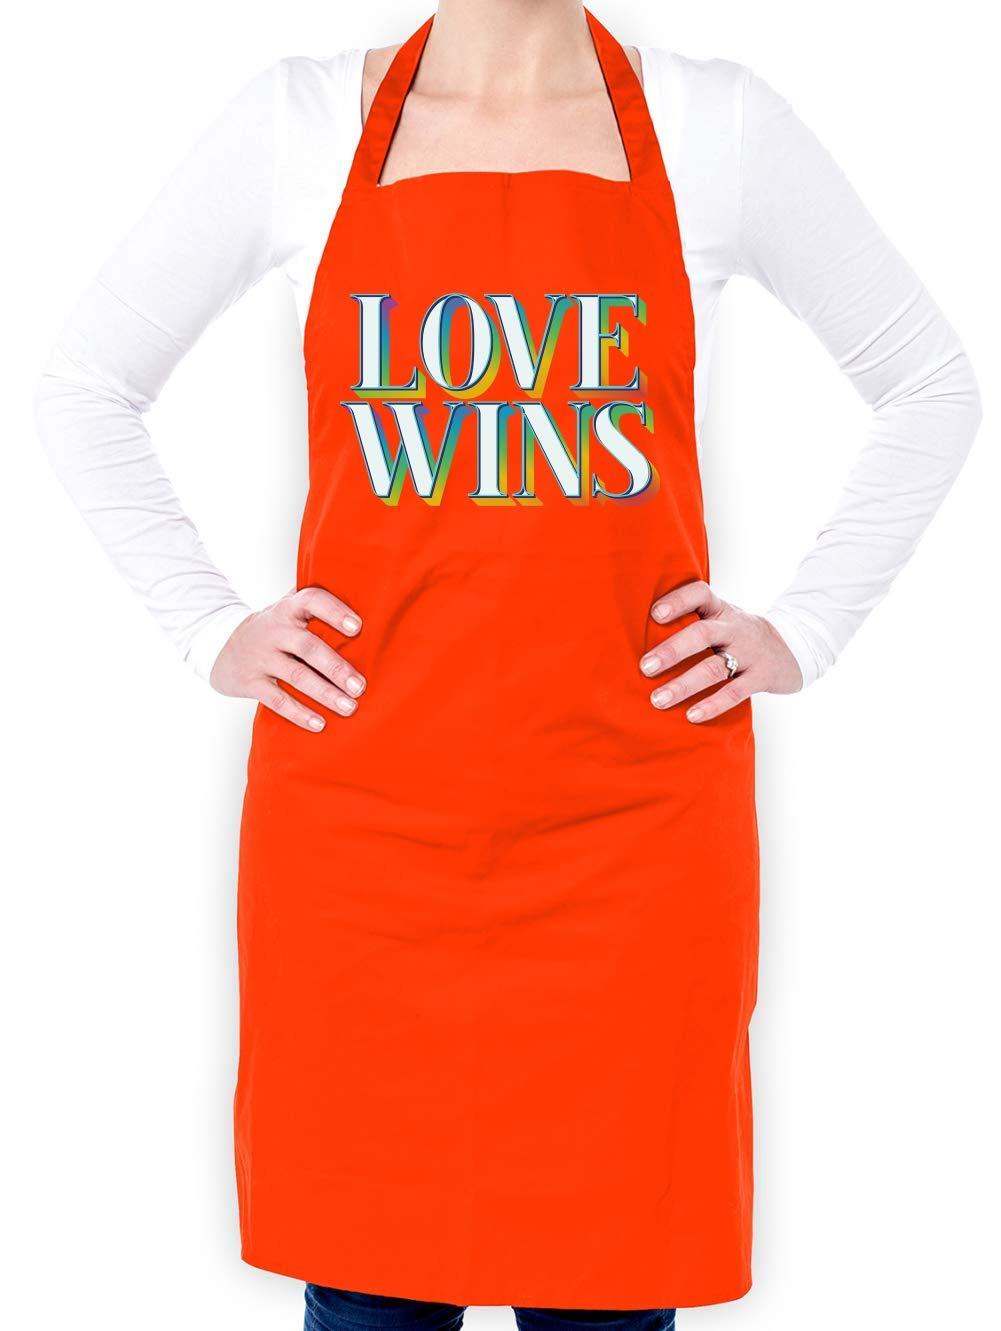 Dressdown Love Wins - Unisex Adult Apron - Orange - One Size